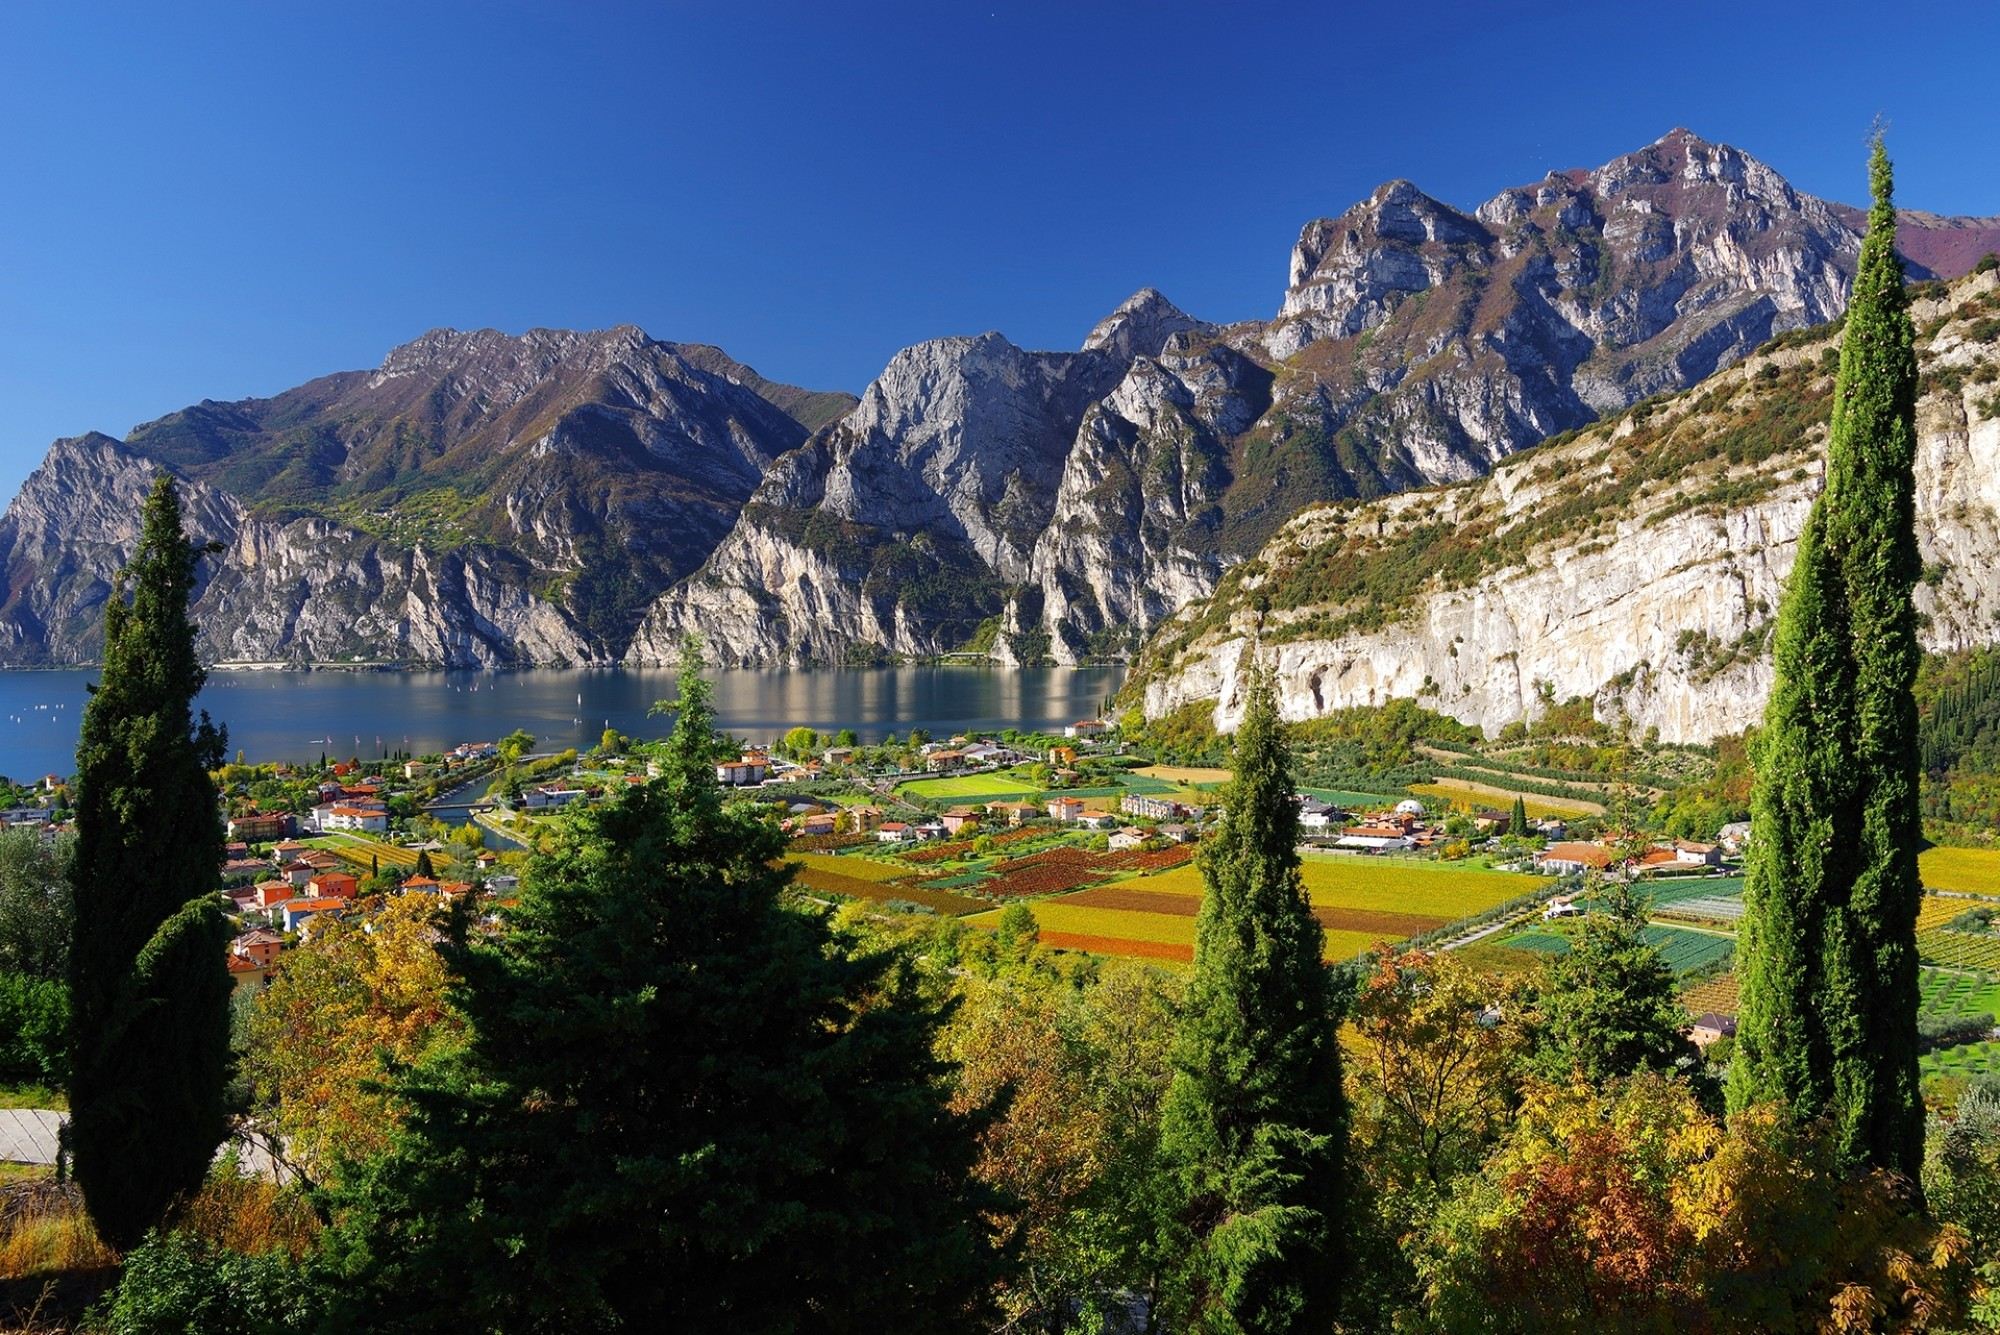 Lake-Garda-from-Riva-del-Garda_shutterstock_751897888_Mikadun